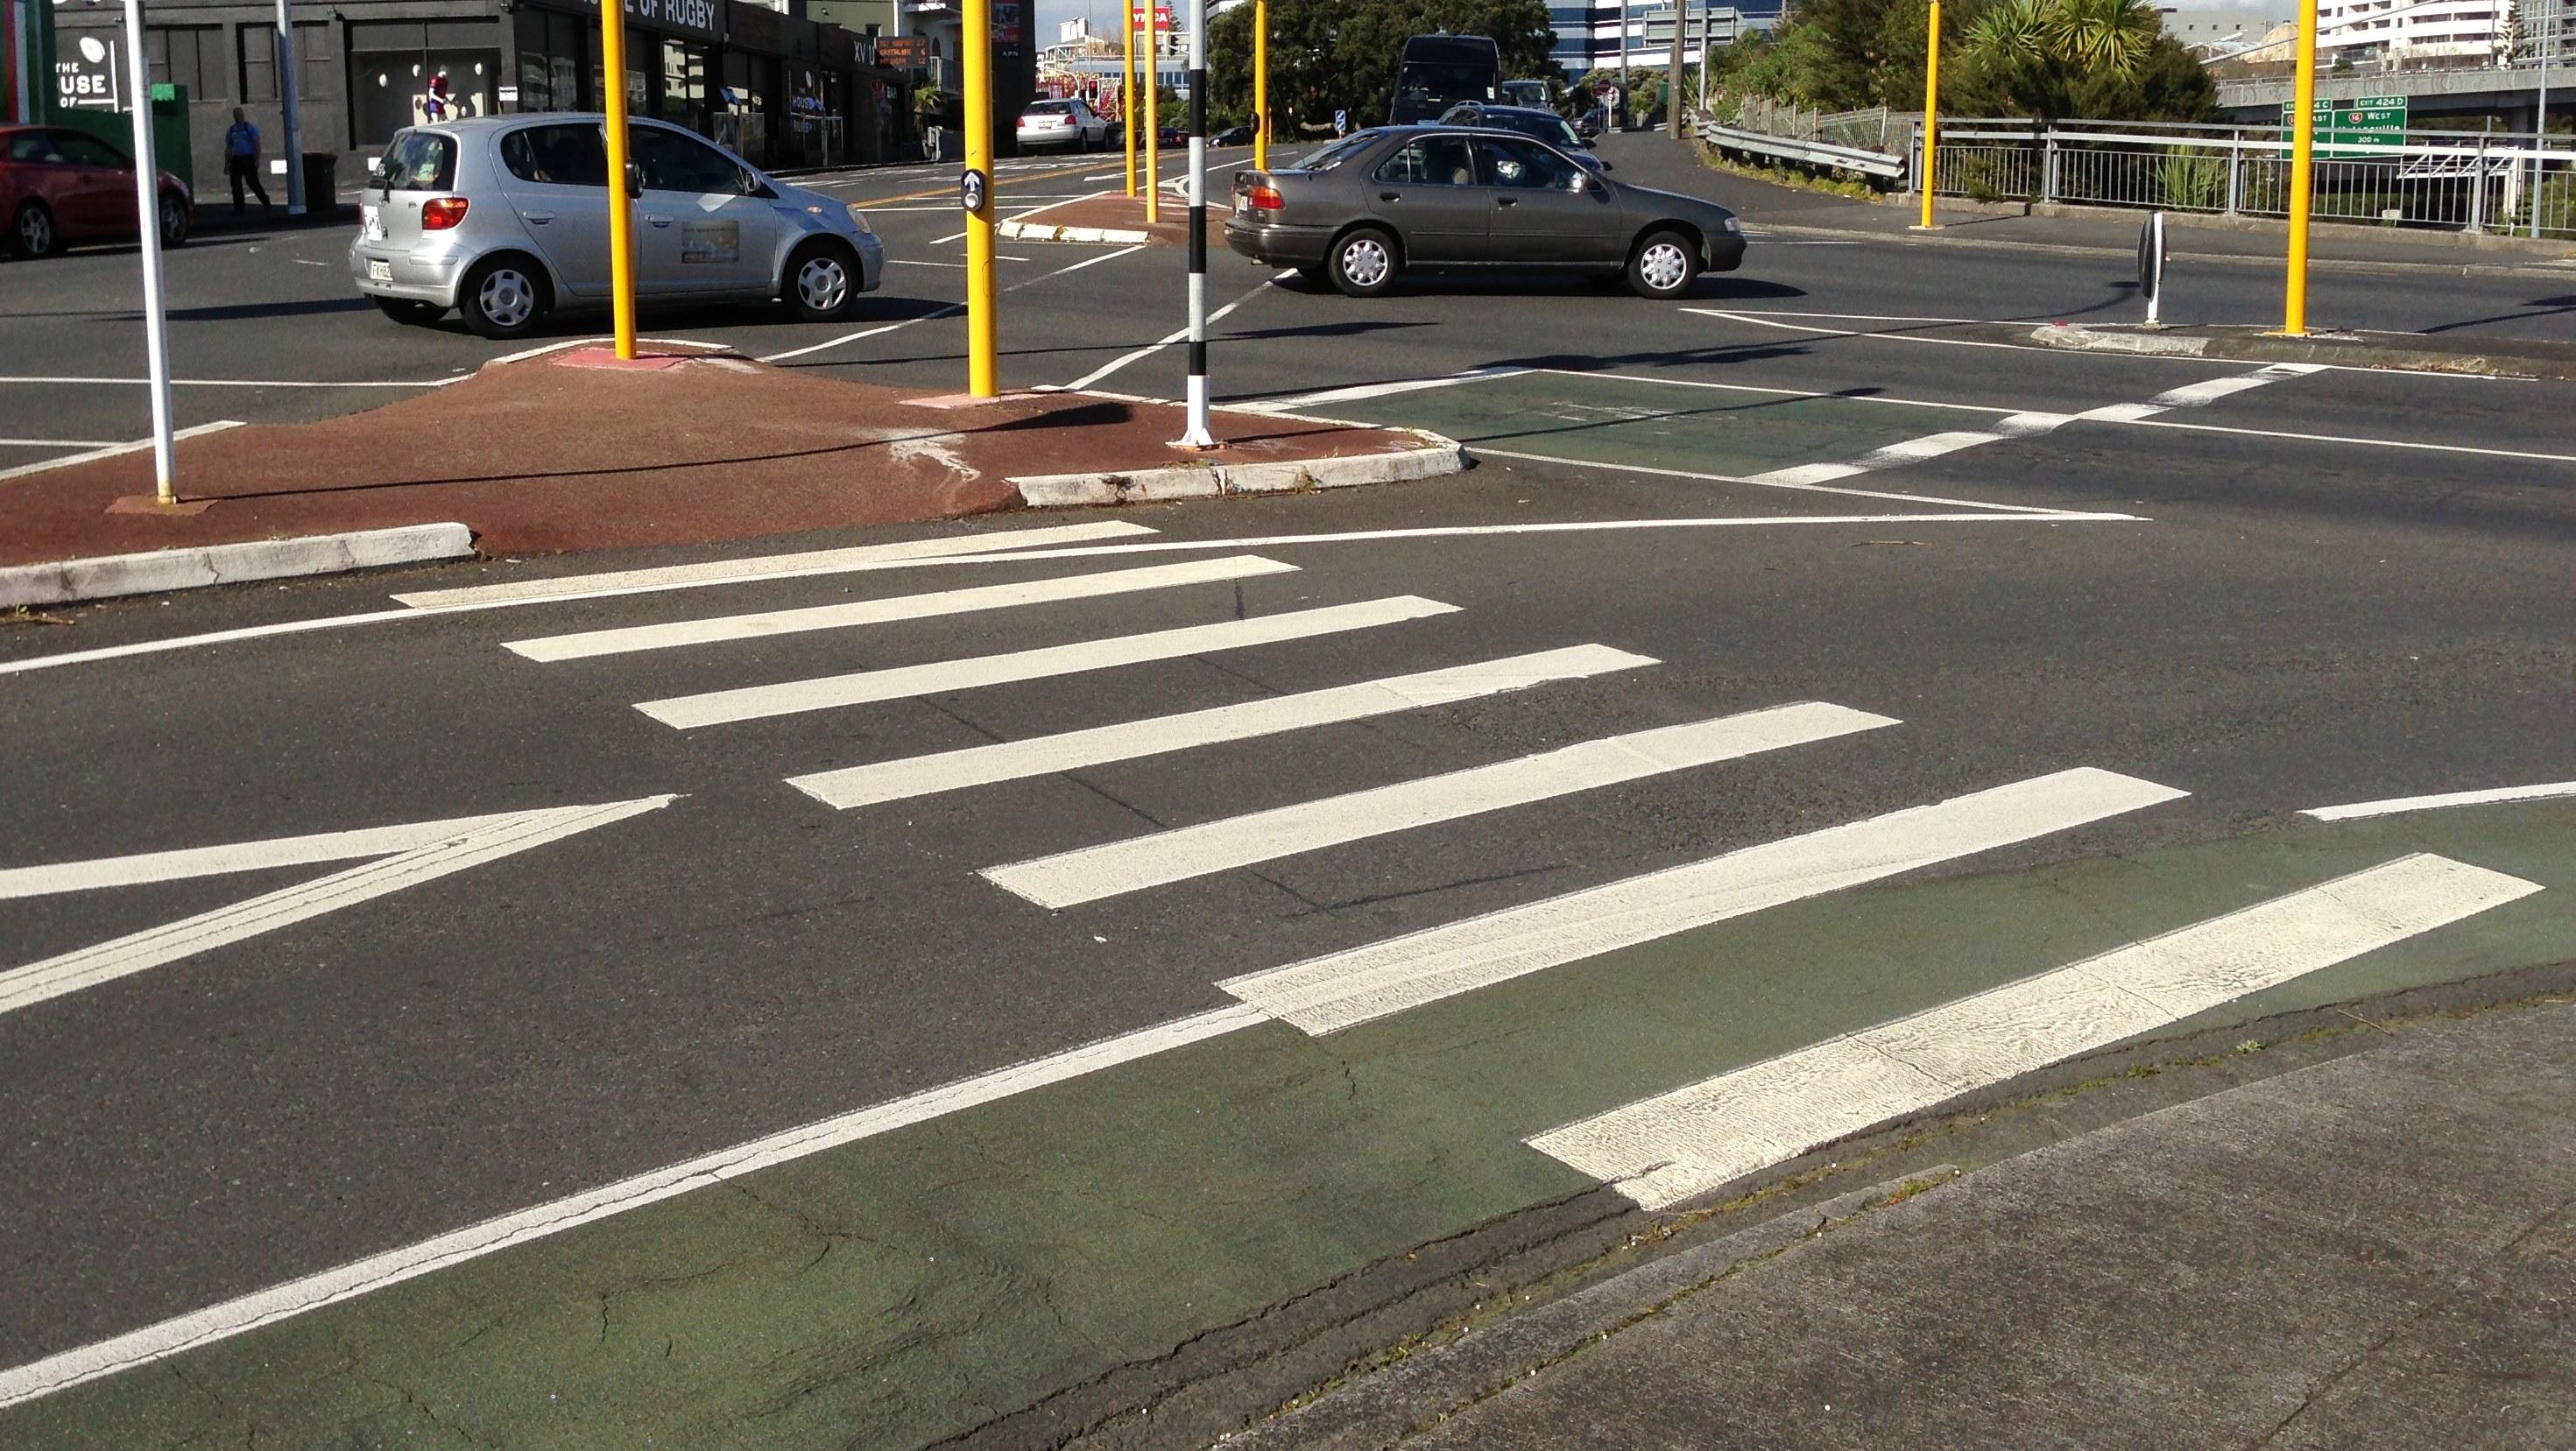 File:Pedestrian crossing and bike lane.JPG - Wikimedia Commons